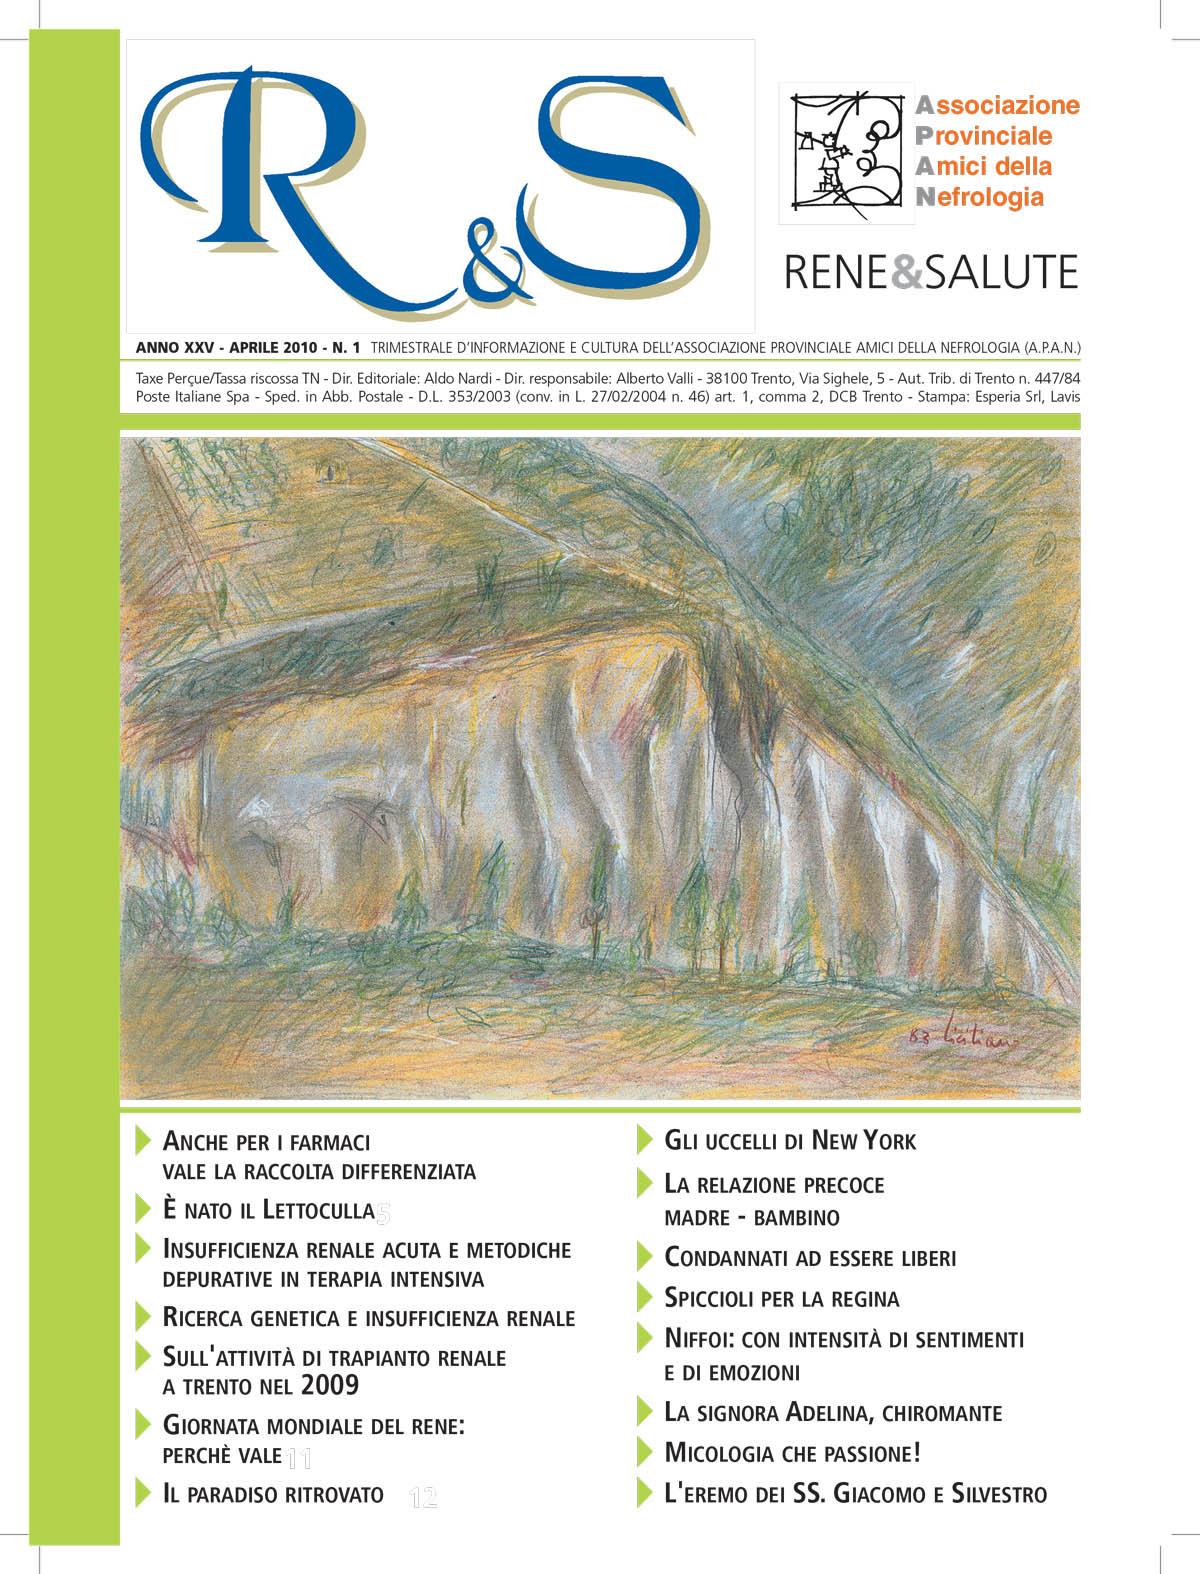 Rene & Salute 2010.1